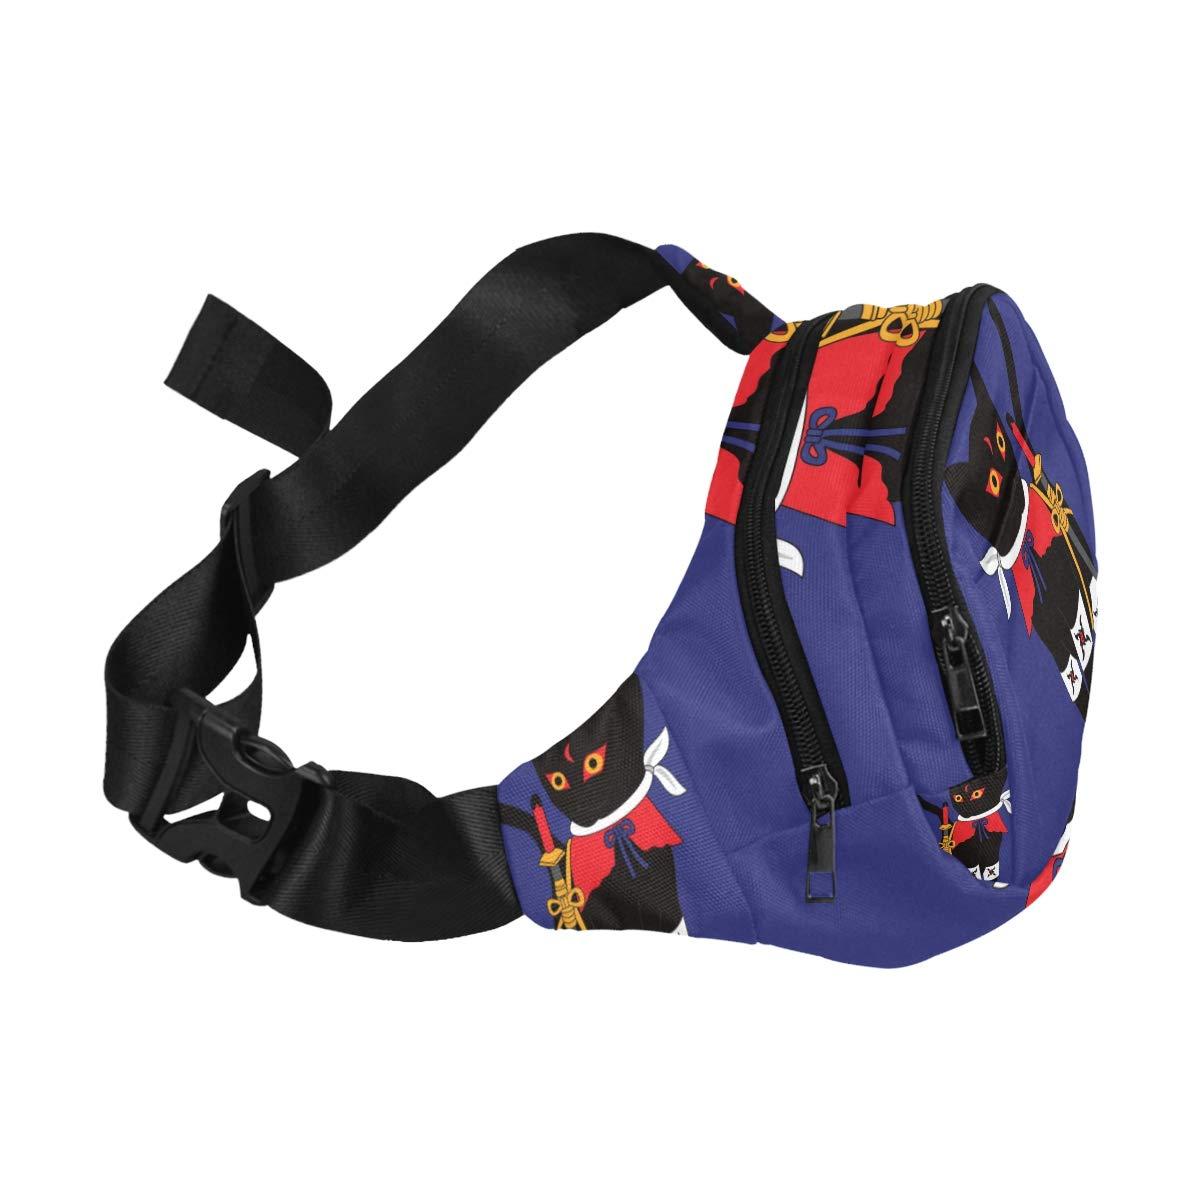 Black Cool Ninja Cat Fenny Packs Waist Bags Adjustable Belt Waterproof Nylon Travel Running Sport Vacation Party For Men Women Boys Girls Kids